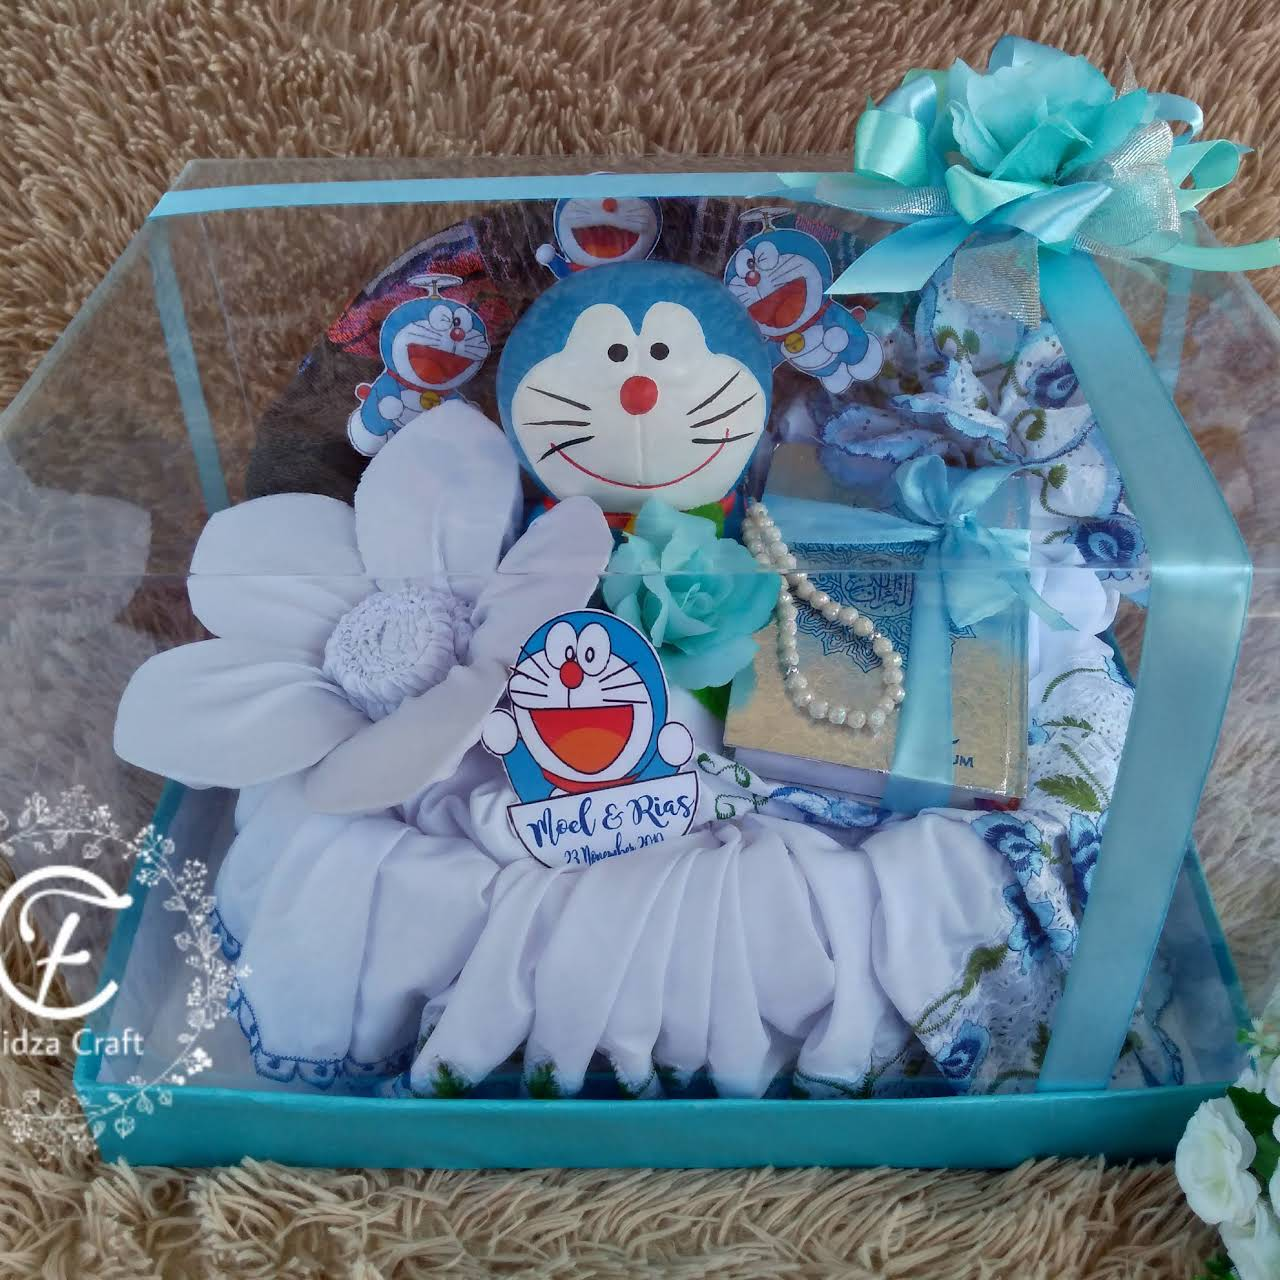 Fidza Craft Wedding Souvenir Shop